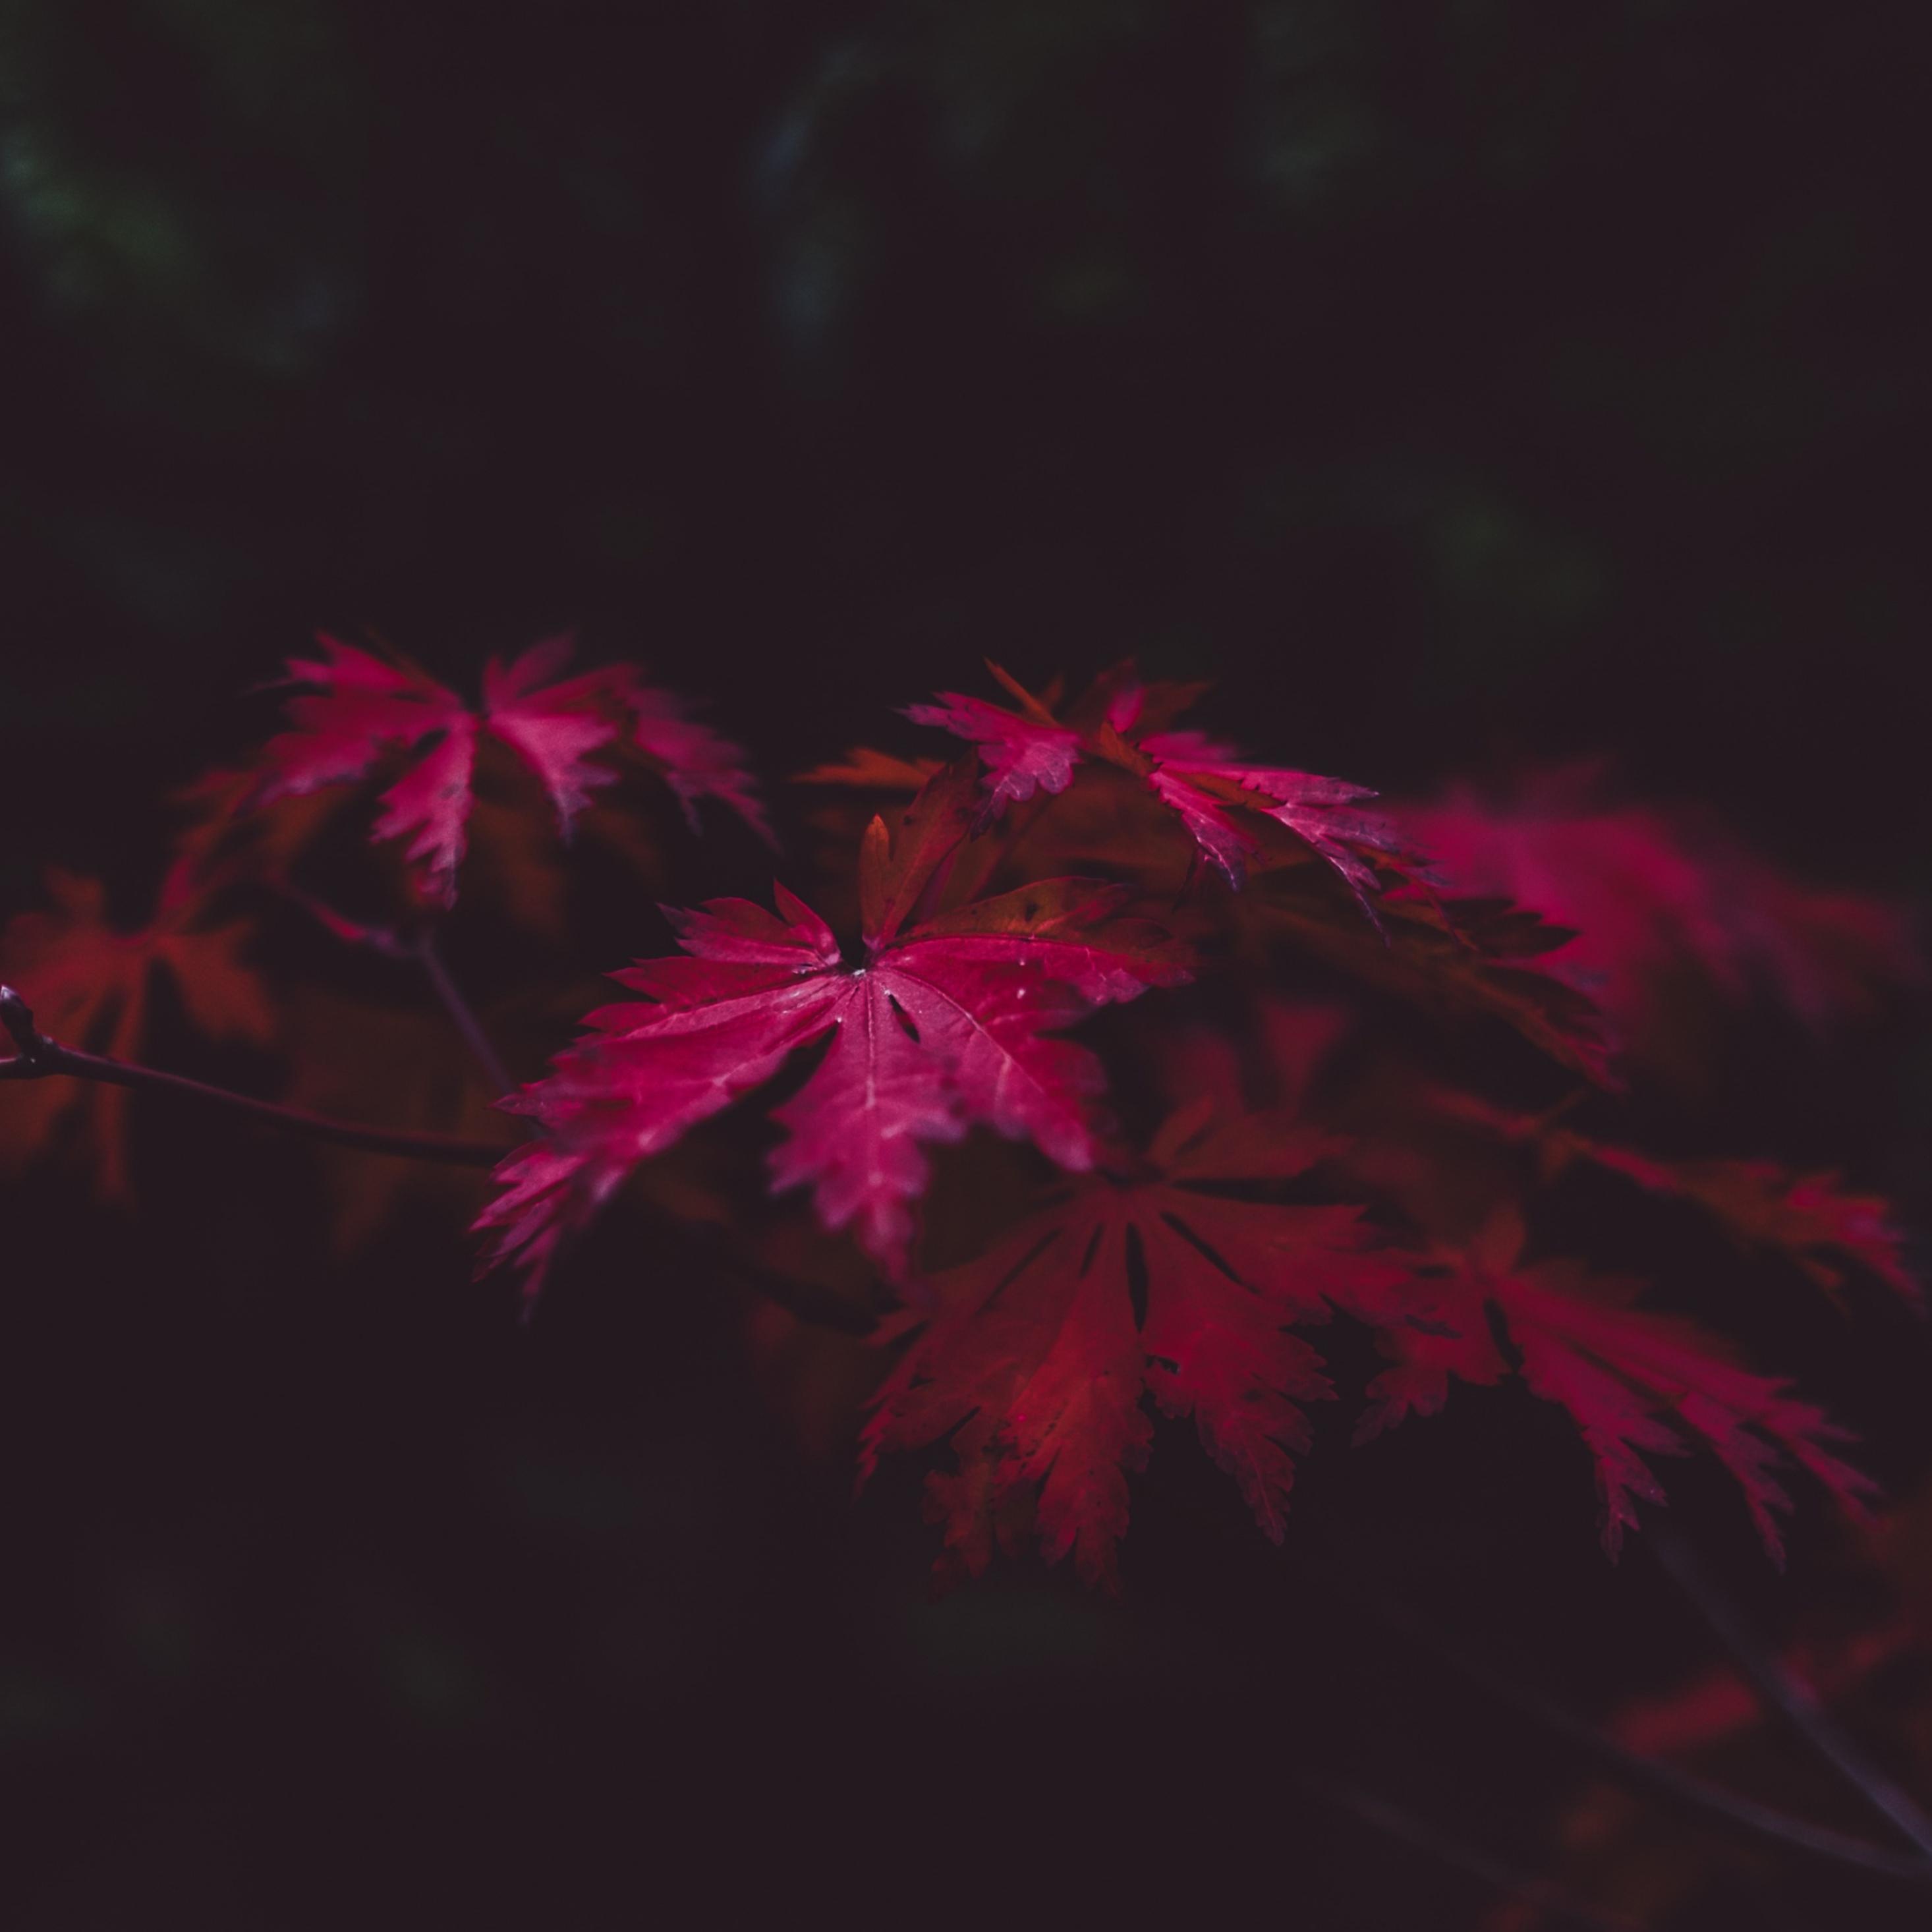 2932x2932 Red Leaves 4k Ipad Pro Retina ...